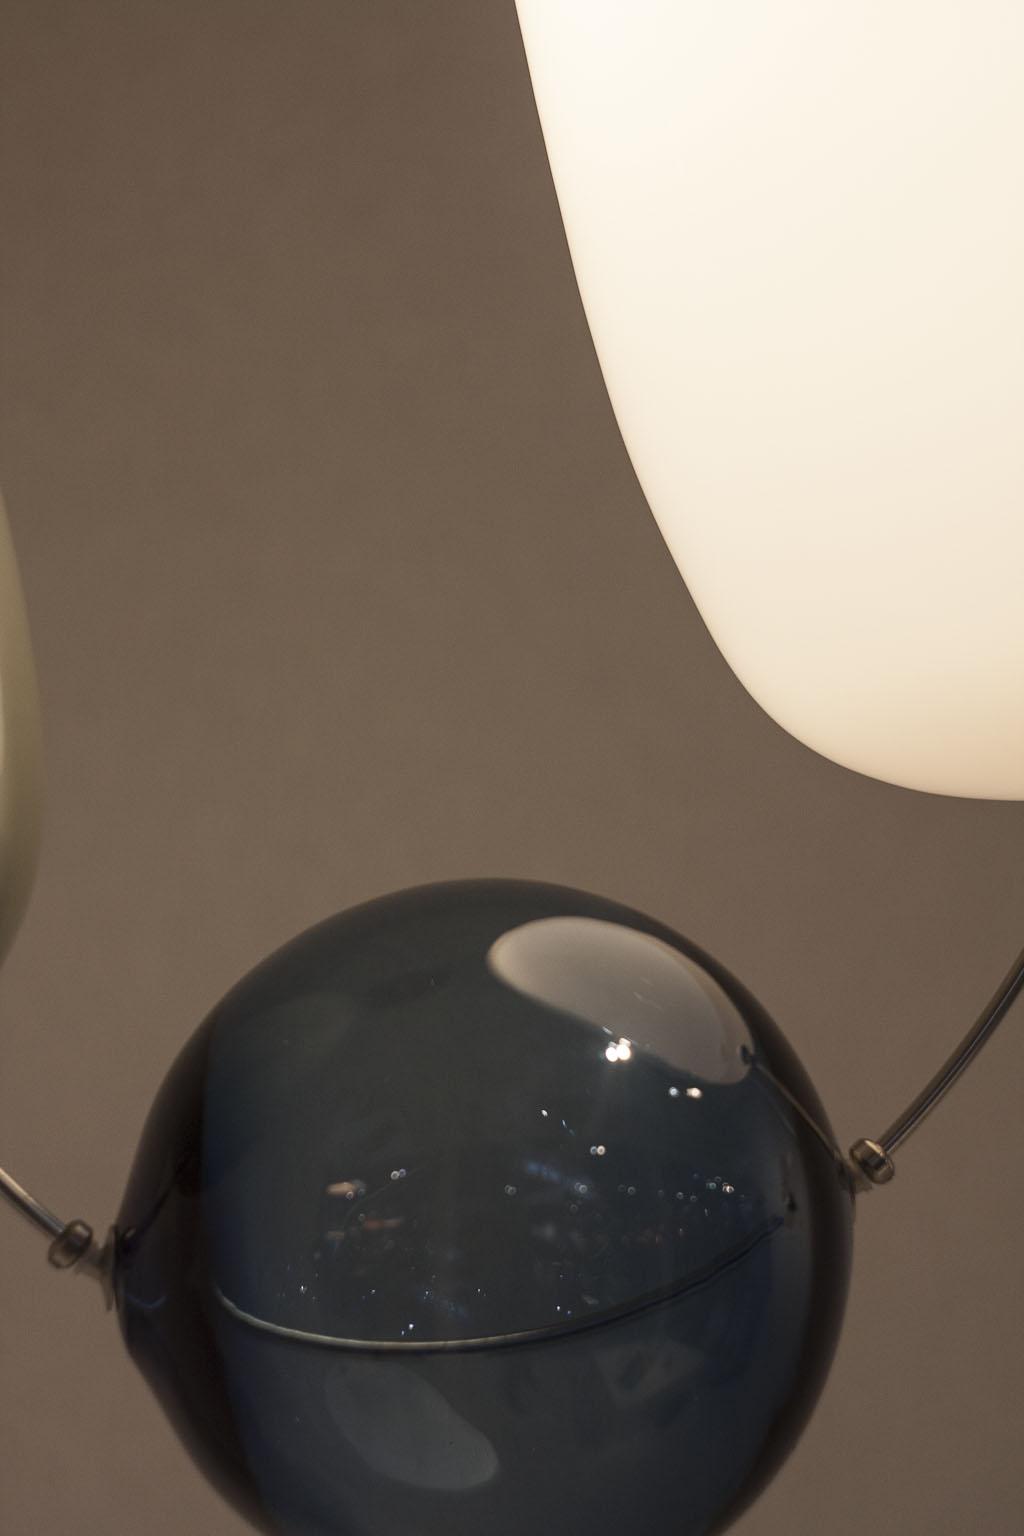 Lampe Hely Jewel par Katriina Nuutinen (Filande) (2009)